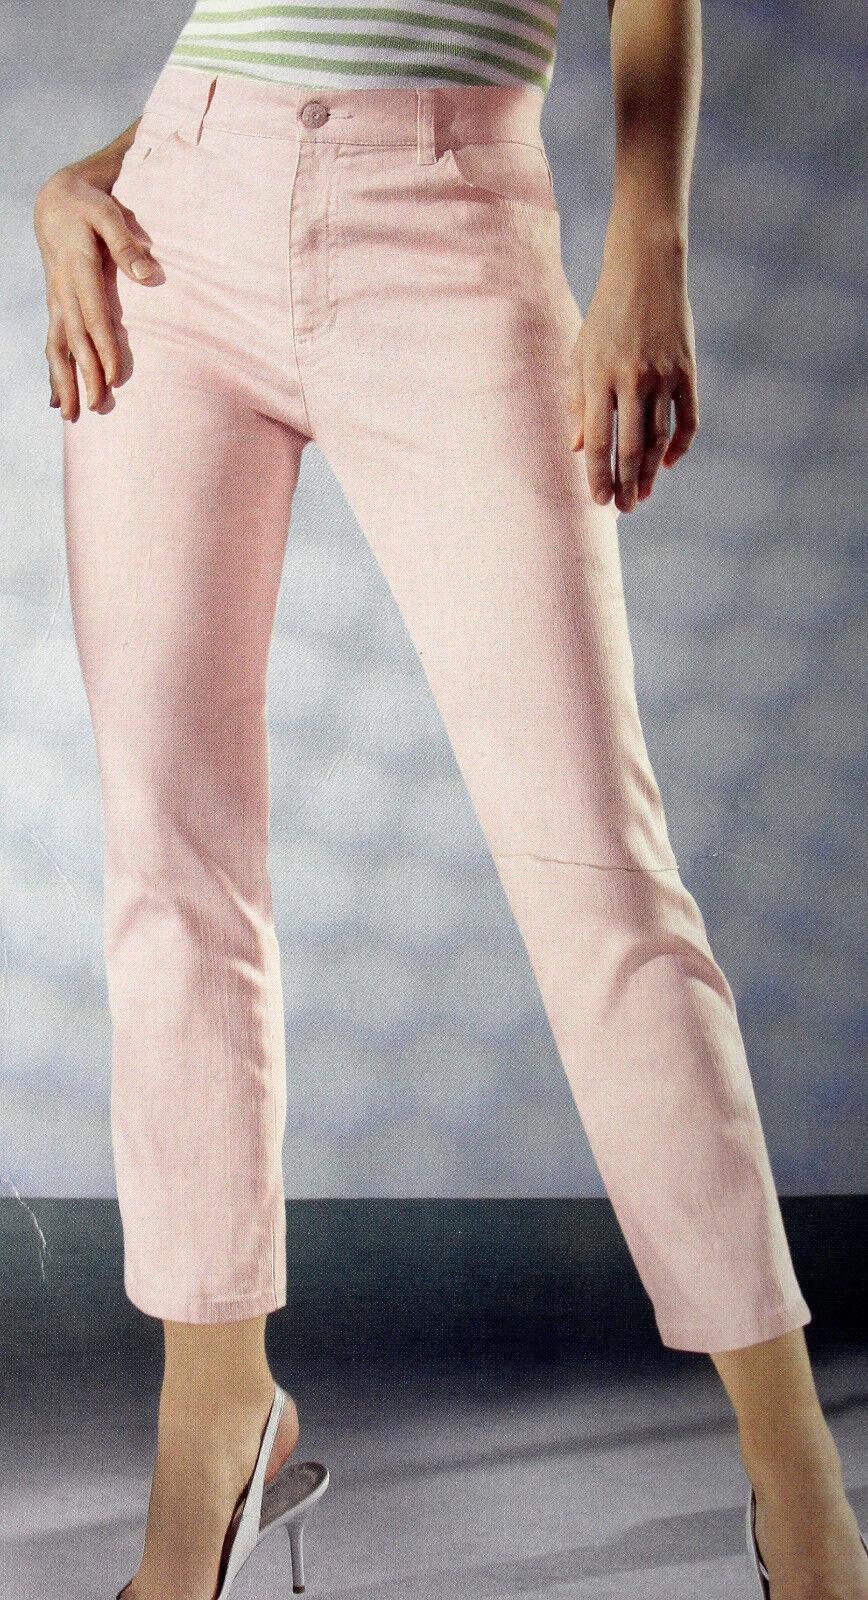 Hose 7/8 Damen 3/4 Hosen Twillhose rosa 5-Pocket Twillhosen